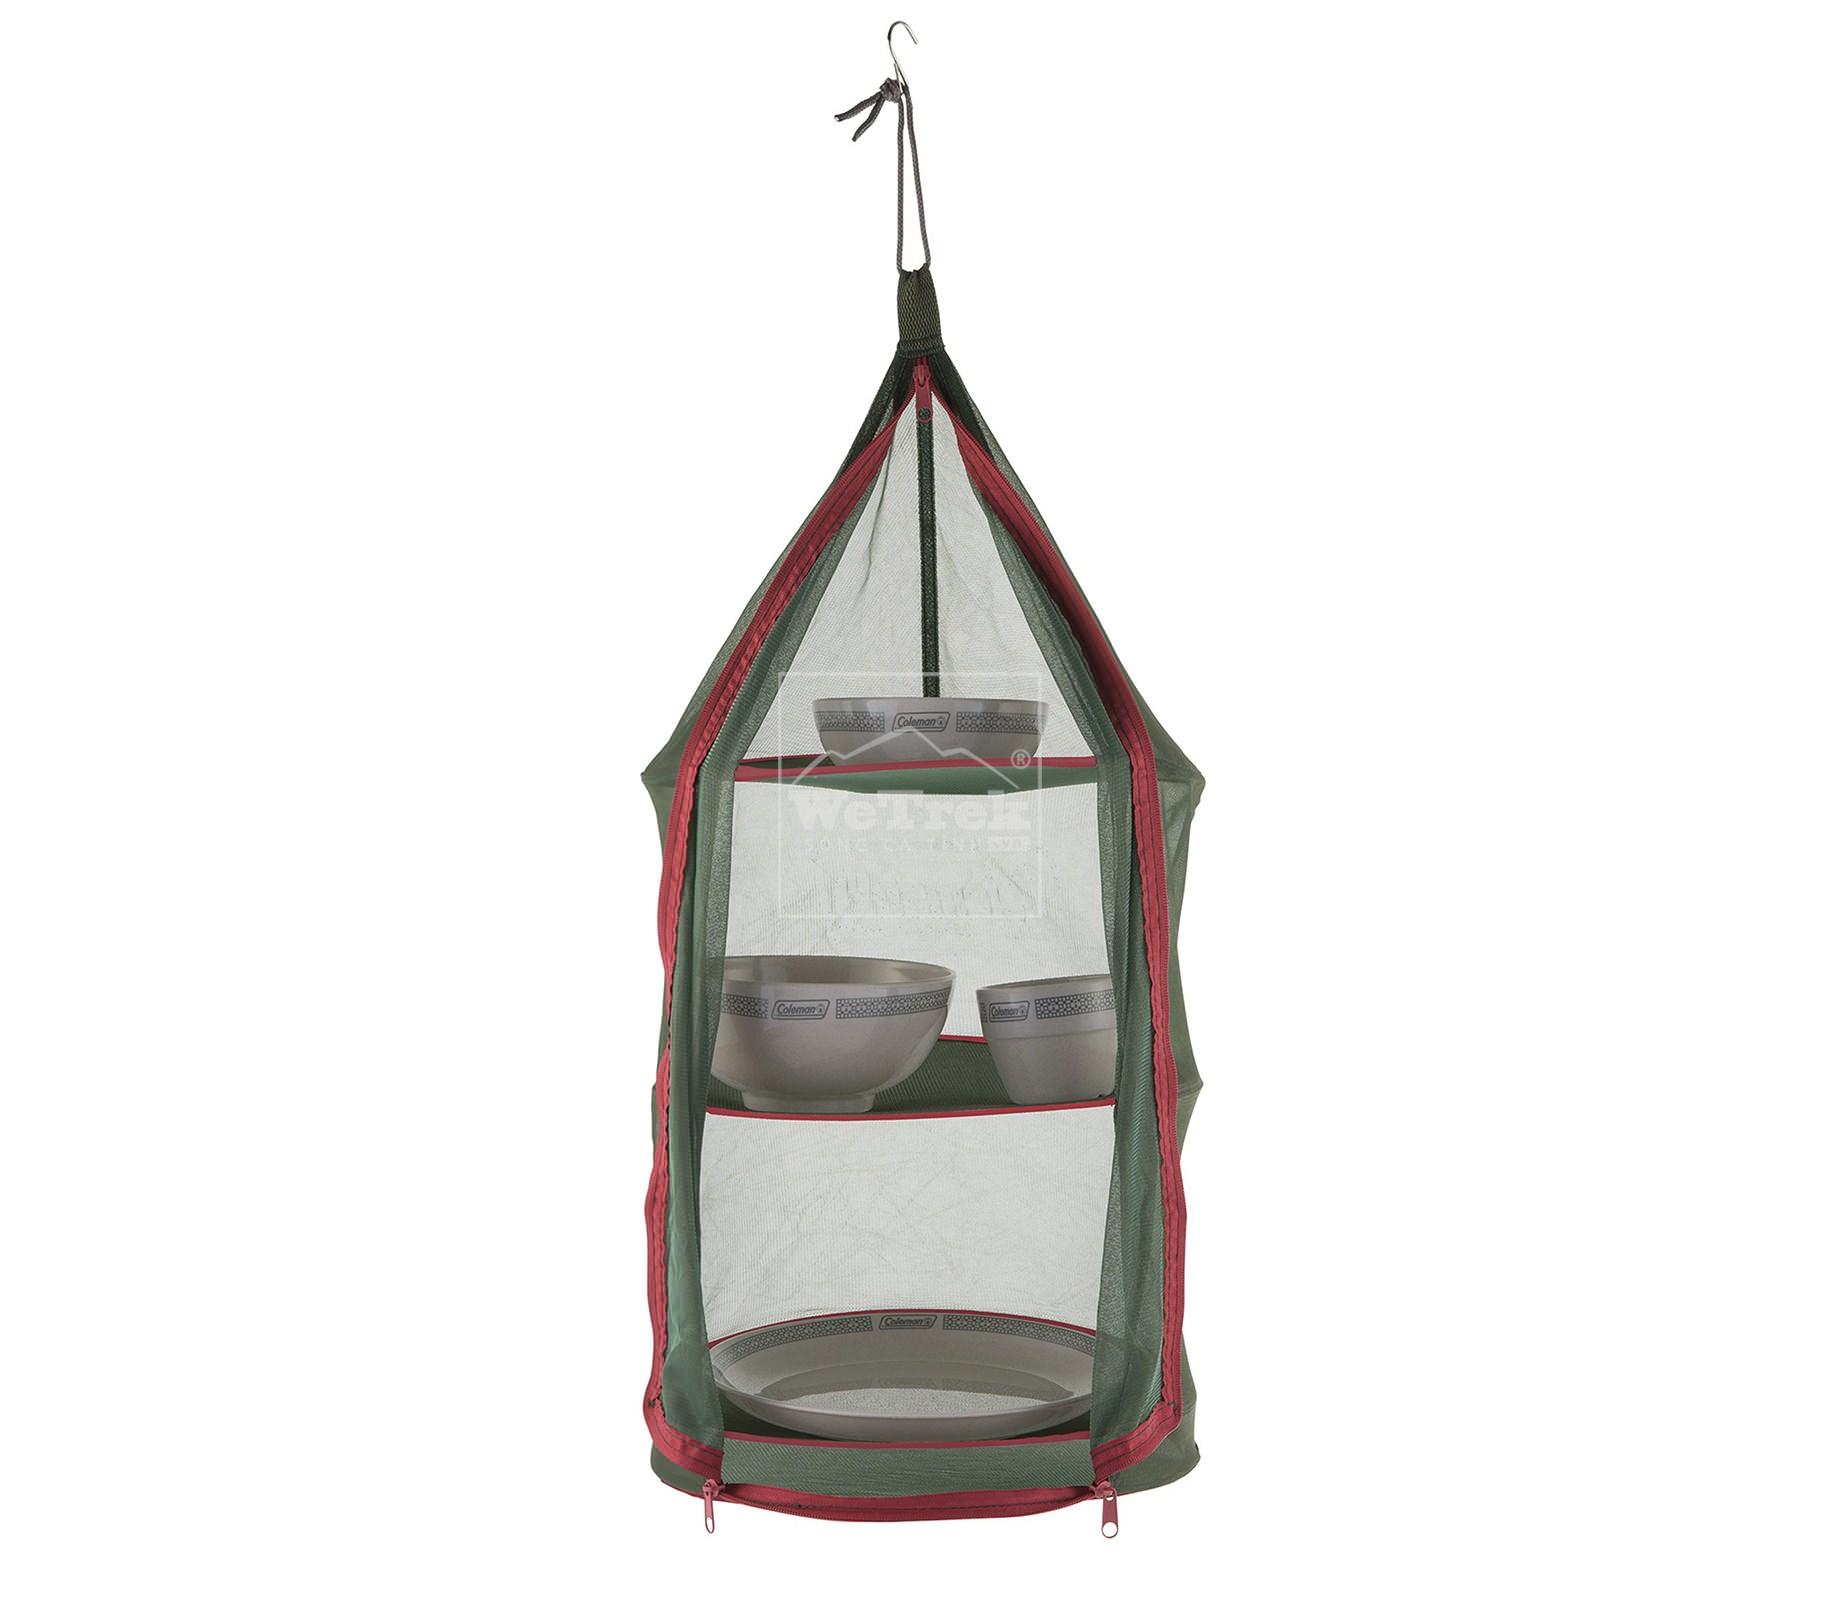 gia-treo-do-nha-bep-coleman-hanging-dry-net-ll-green-2000026811-7479-wetrek.vn-1